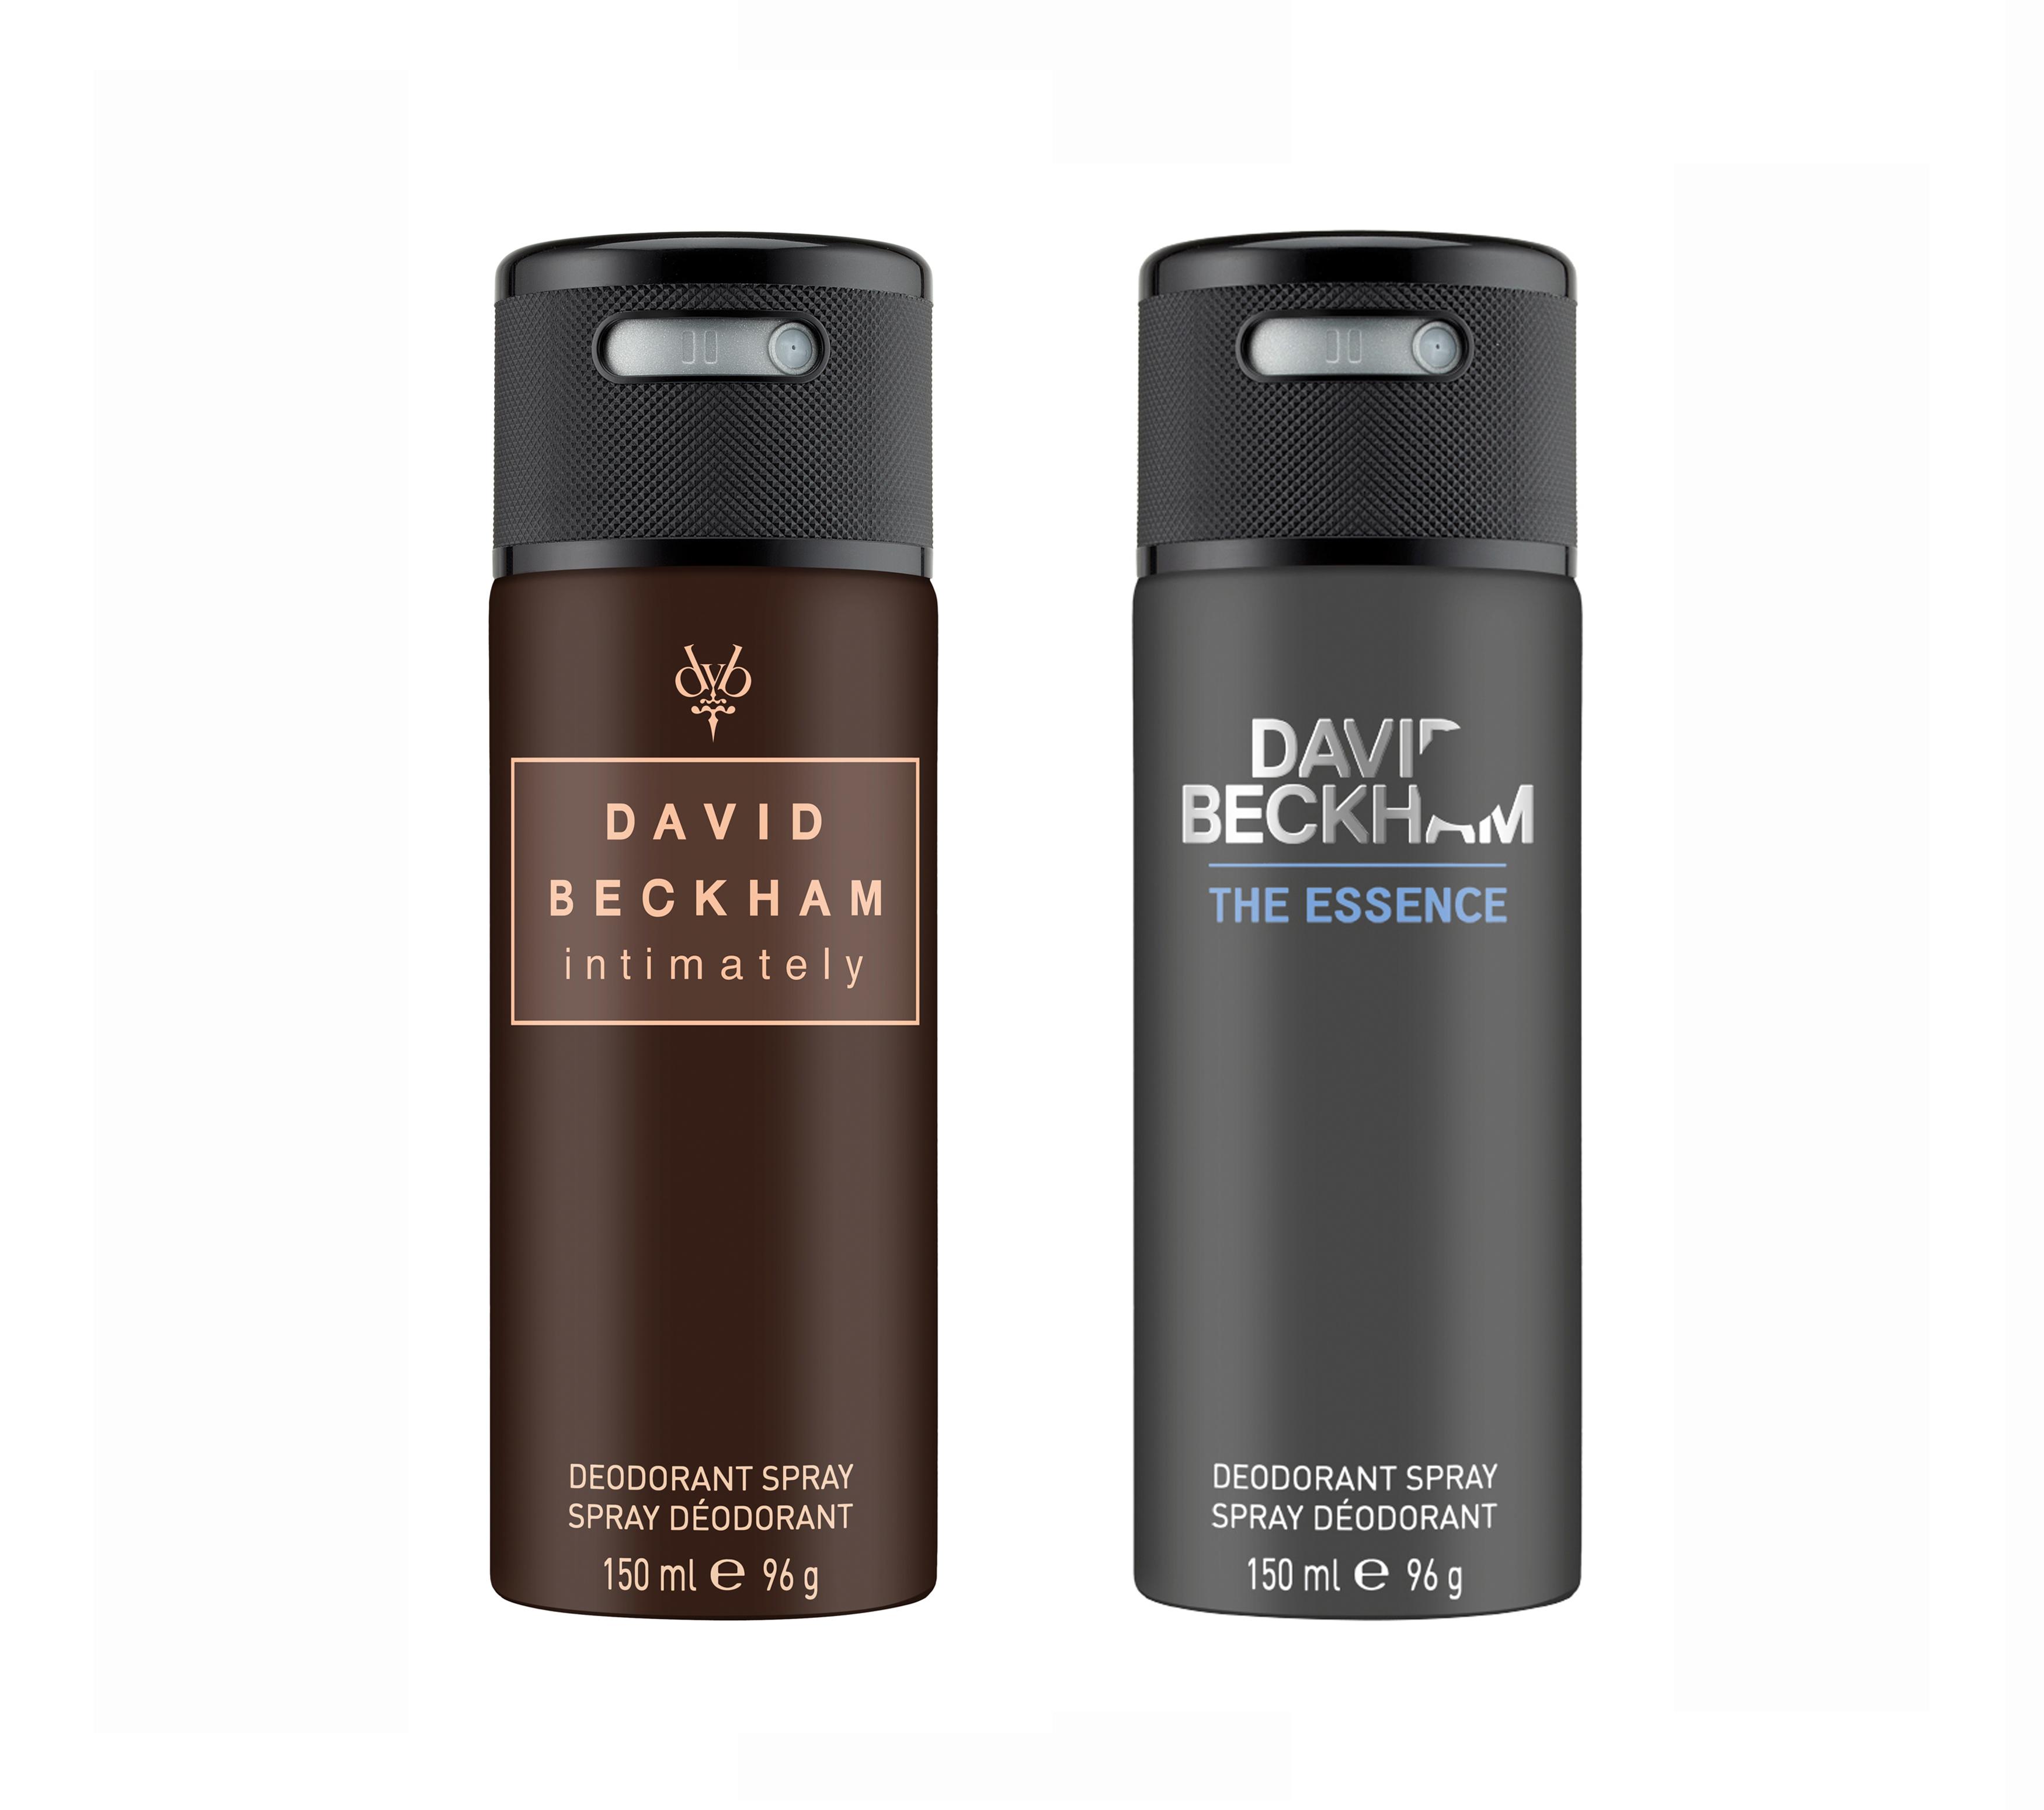 David Beckham | Intimately and Essence Deo Combo Set of 2